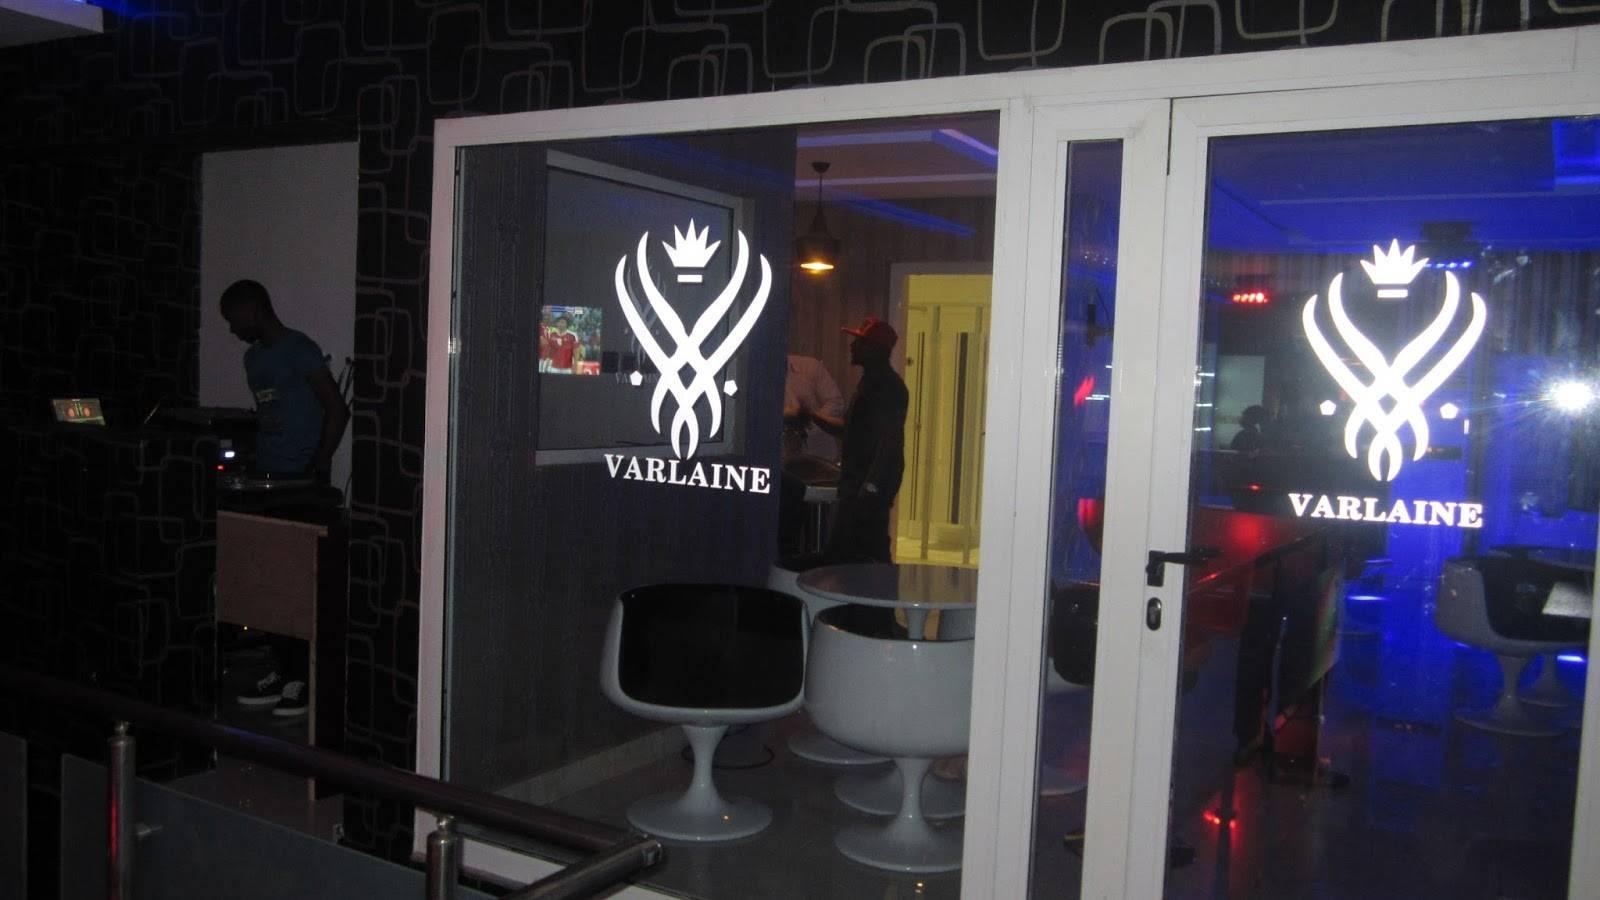 Varlaine Lounge